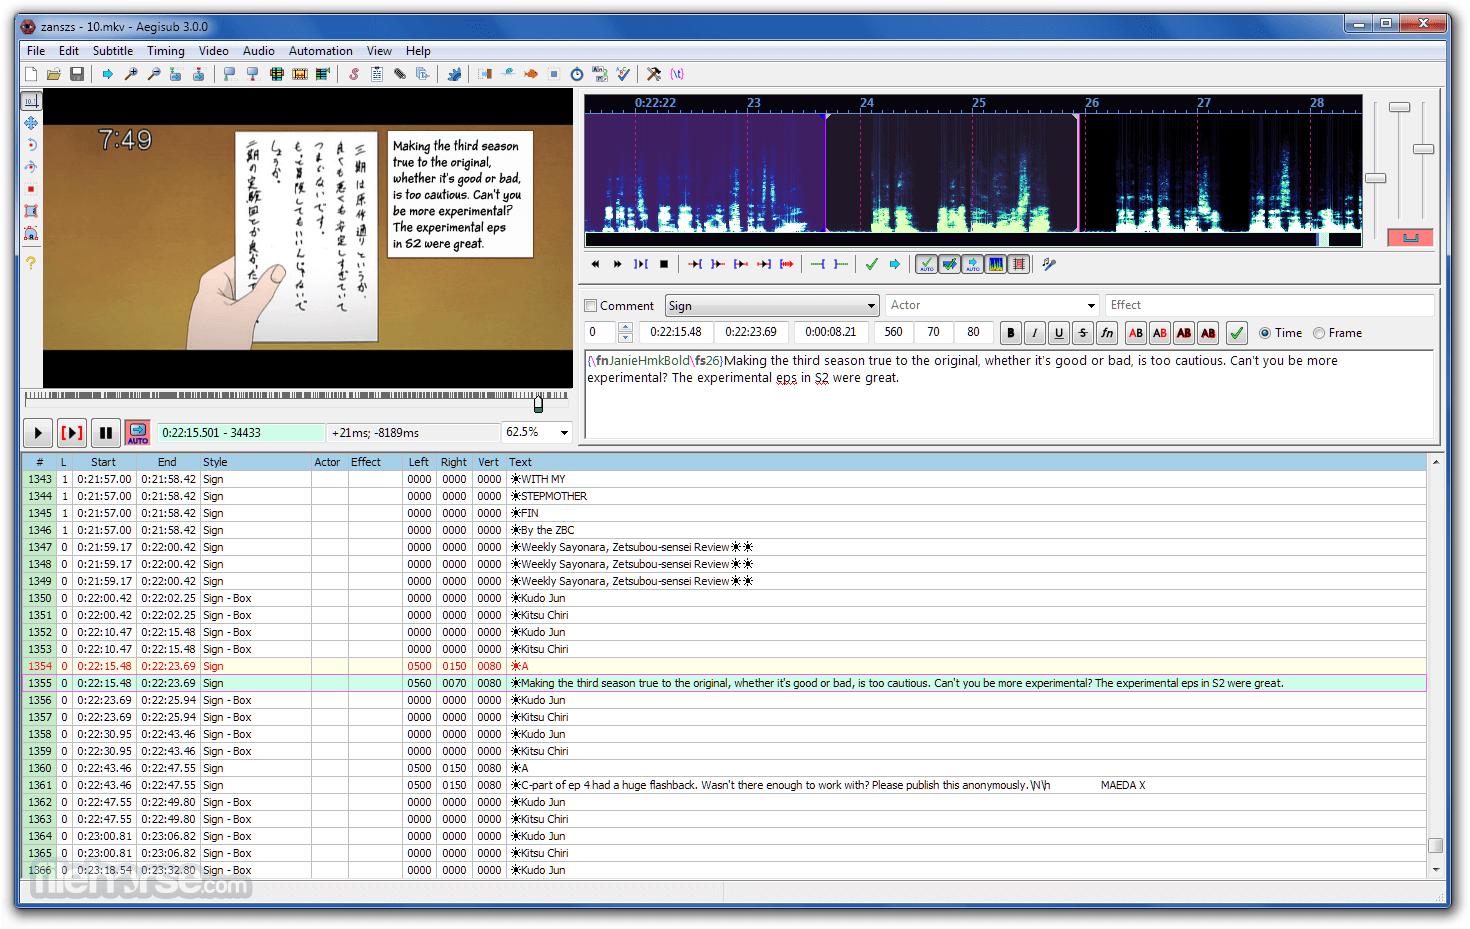 Aegisub 3.2.2 (64-bit) Screenshot 2